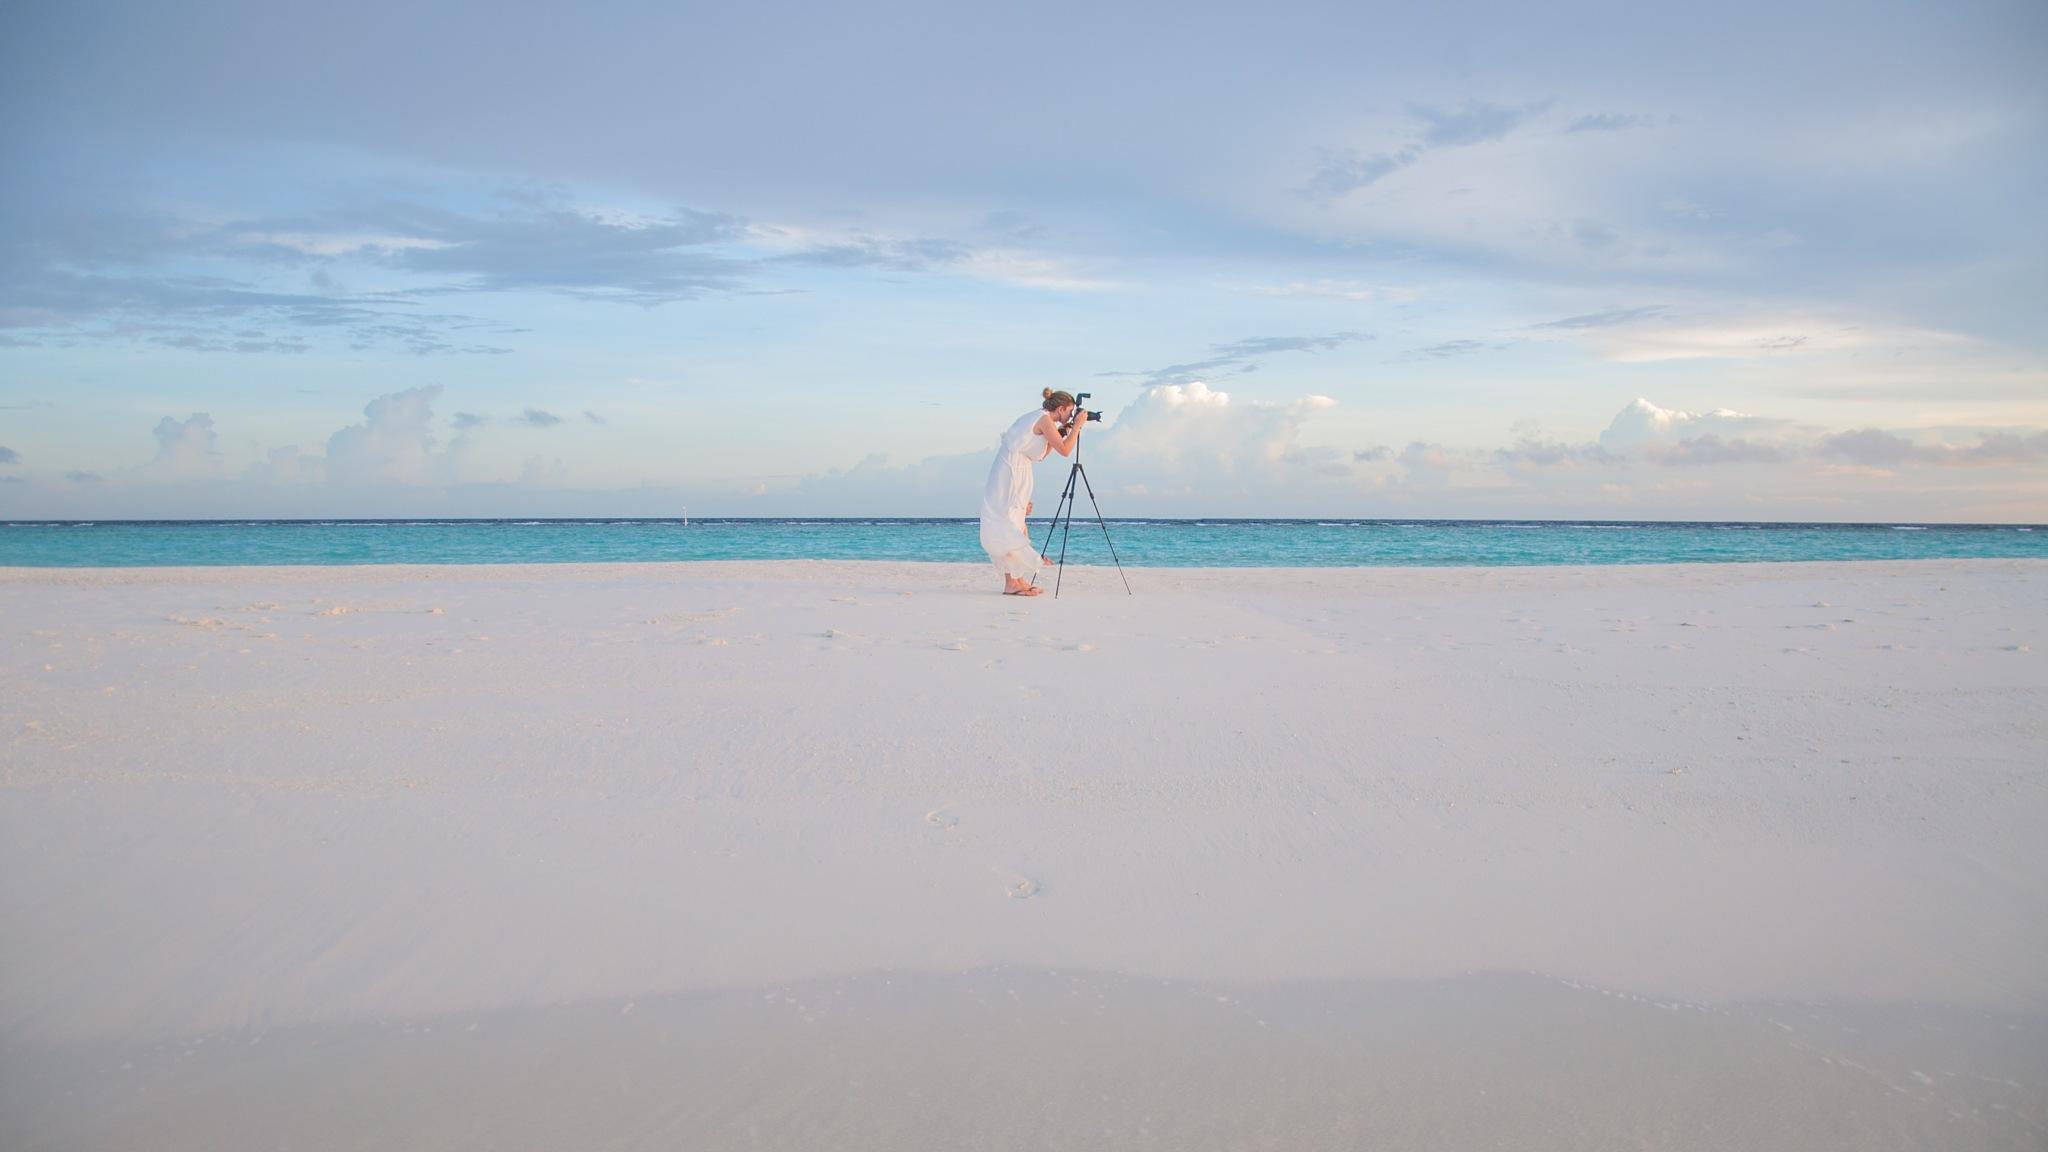 Maldives photographer by Christian Hofmann